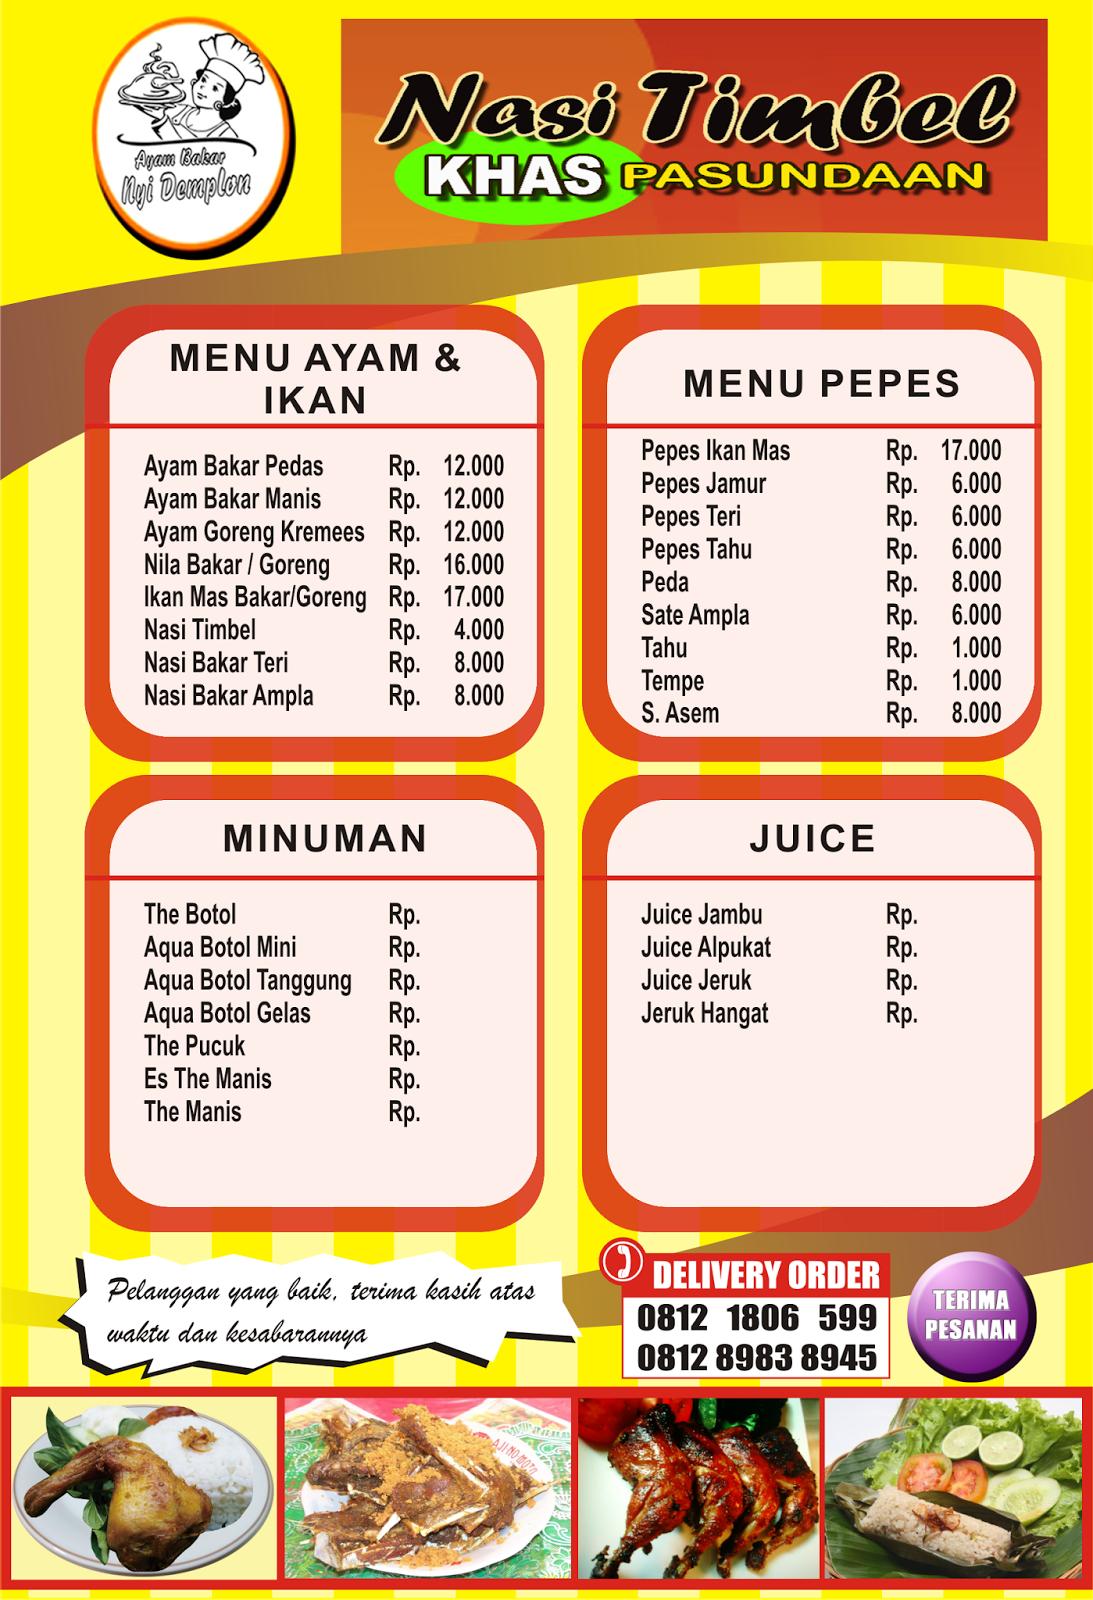 99 Daftar Makanan Rendah Kalori Dalam Tabel